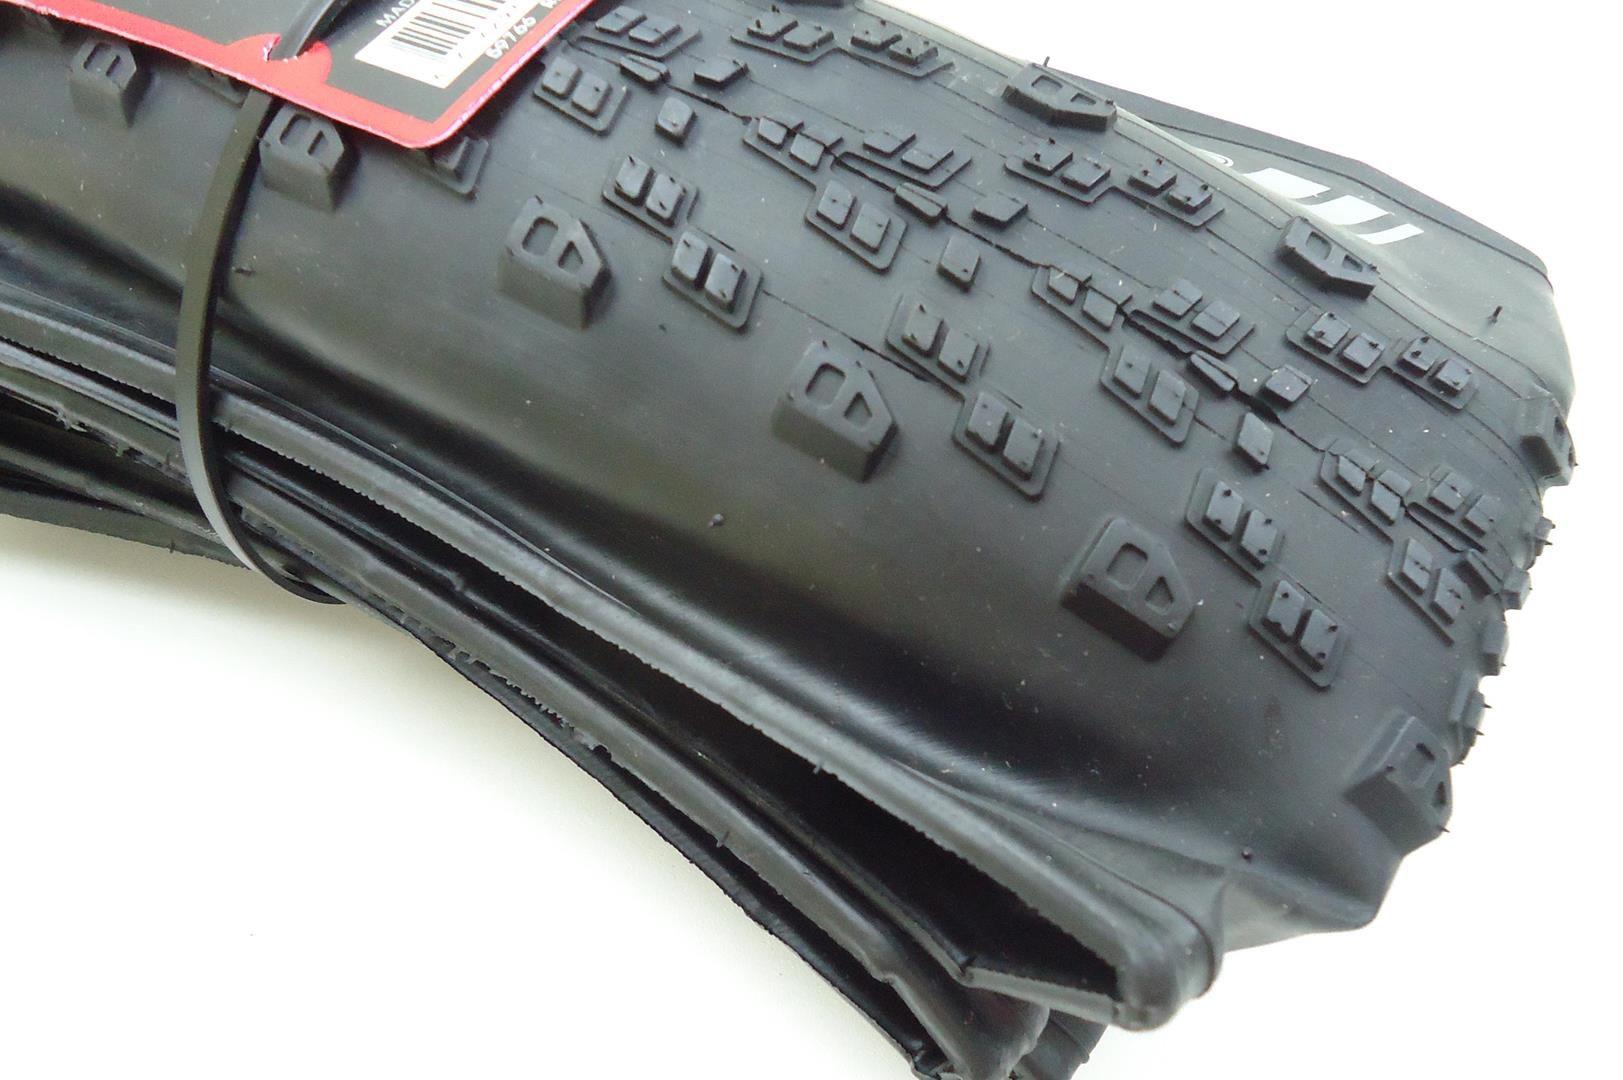 Pneu Bicicleta Mountain Bike Kenda Saber Pro R3C TR 29x2.35 Tubeless Super Leve 540 gramas